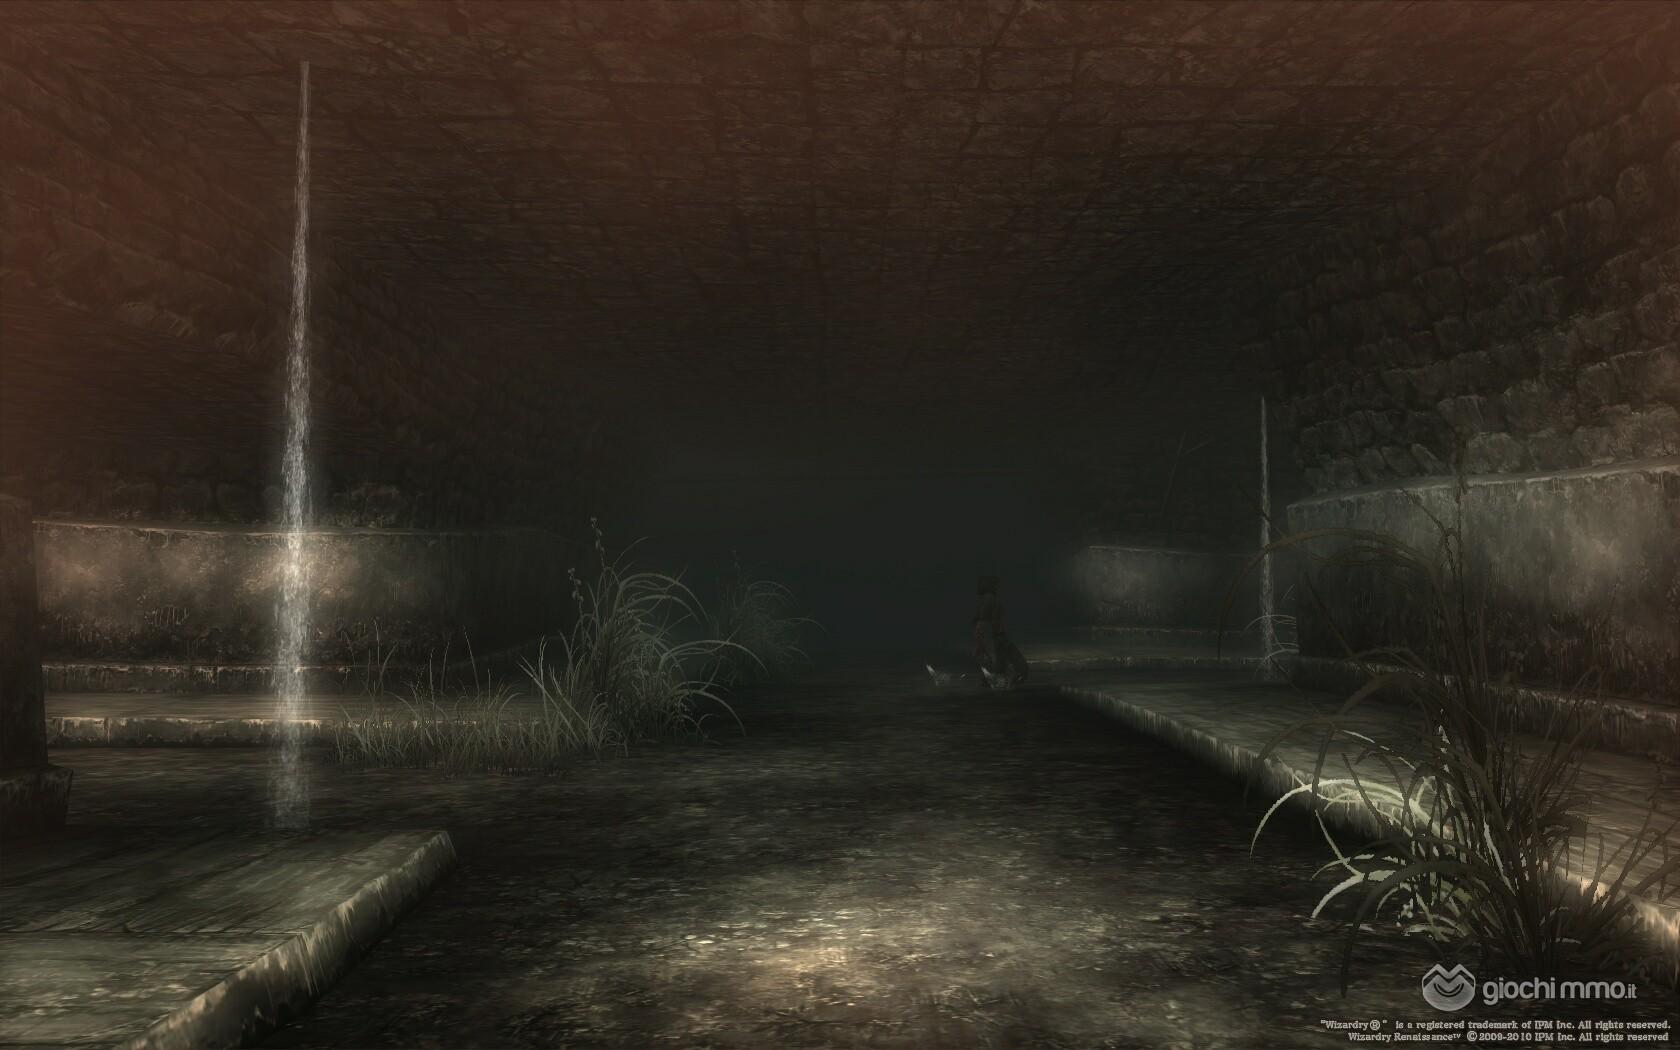 Clicca sull'immagine per ingrandirlaNome:   Wizardry Online screen7.jpgVisite: 24Dimensione:   311.0 KBID: 8299